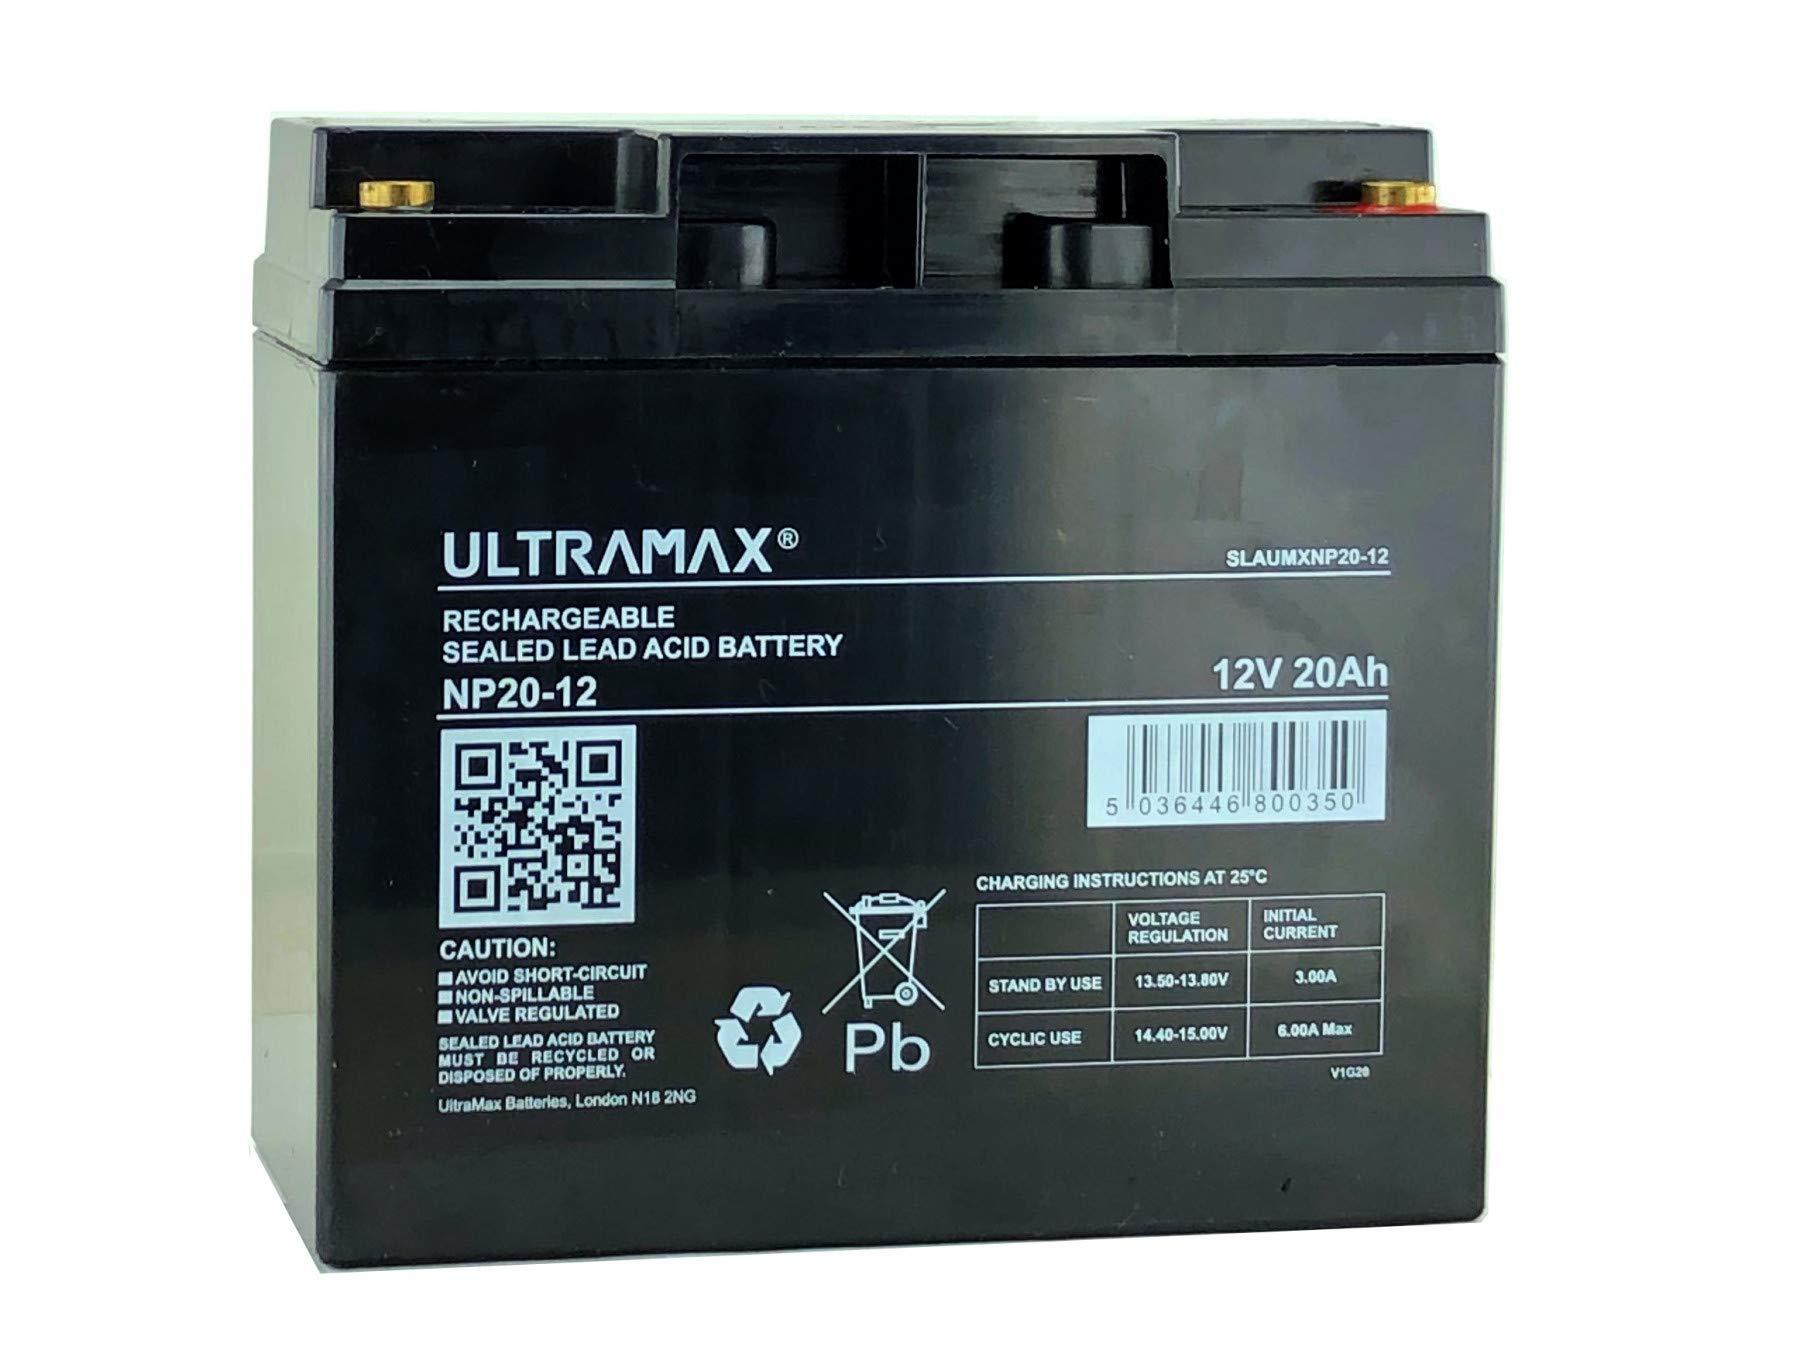 Ultramax 12V 20AH MOTORSPORT LIGHTWEIGHT 6KG RALLY/COMPETITION/RACING CAR BATTERY